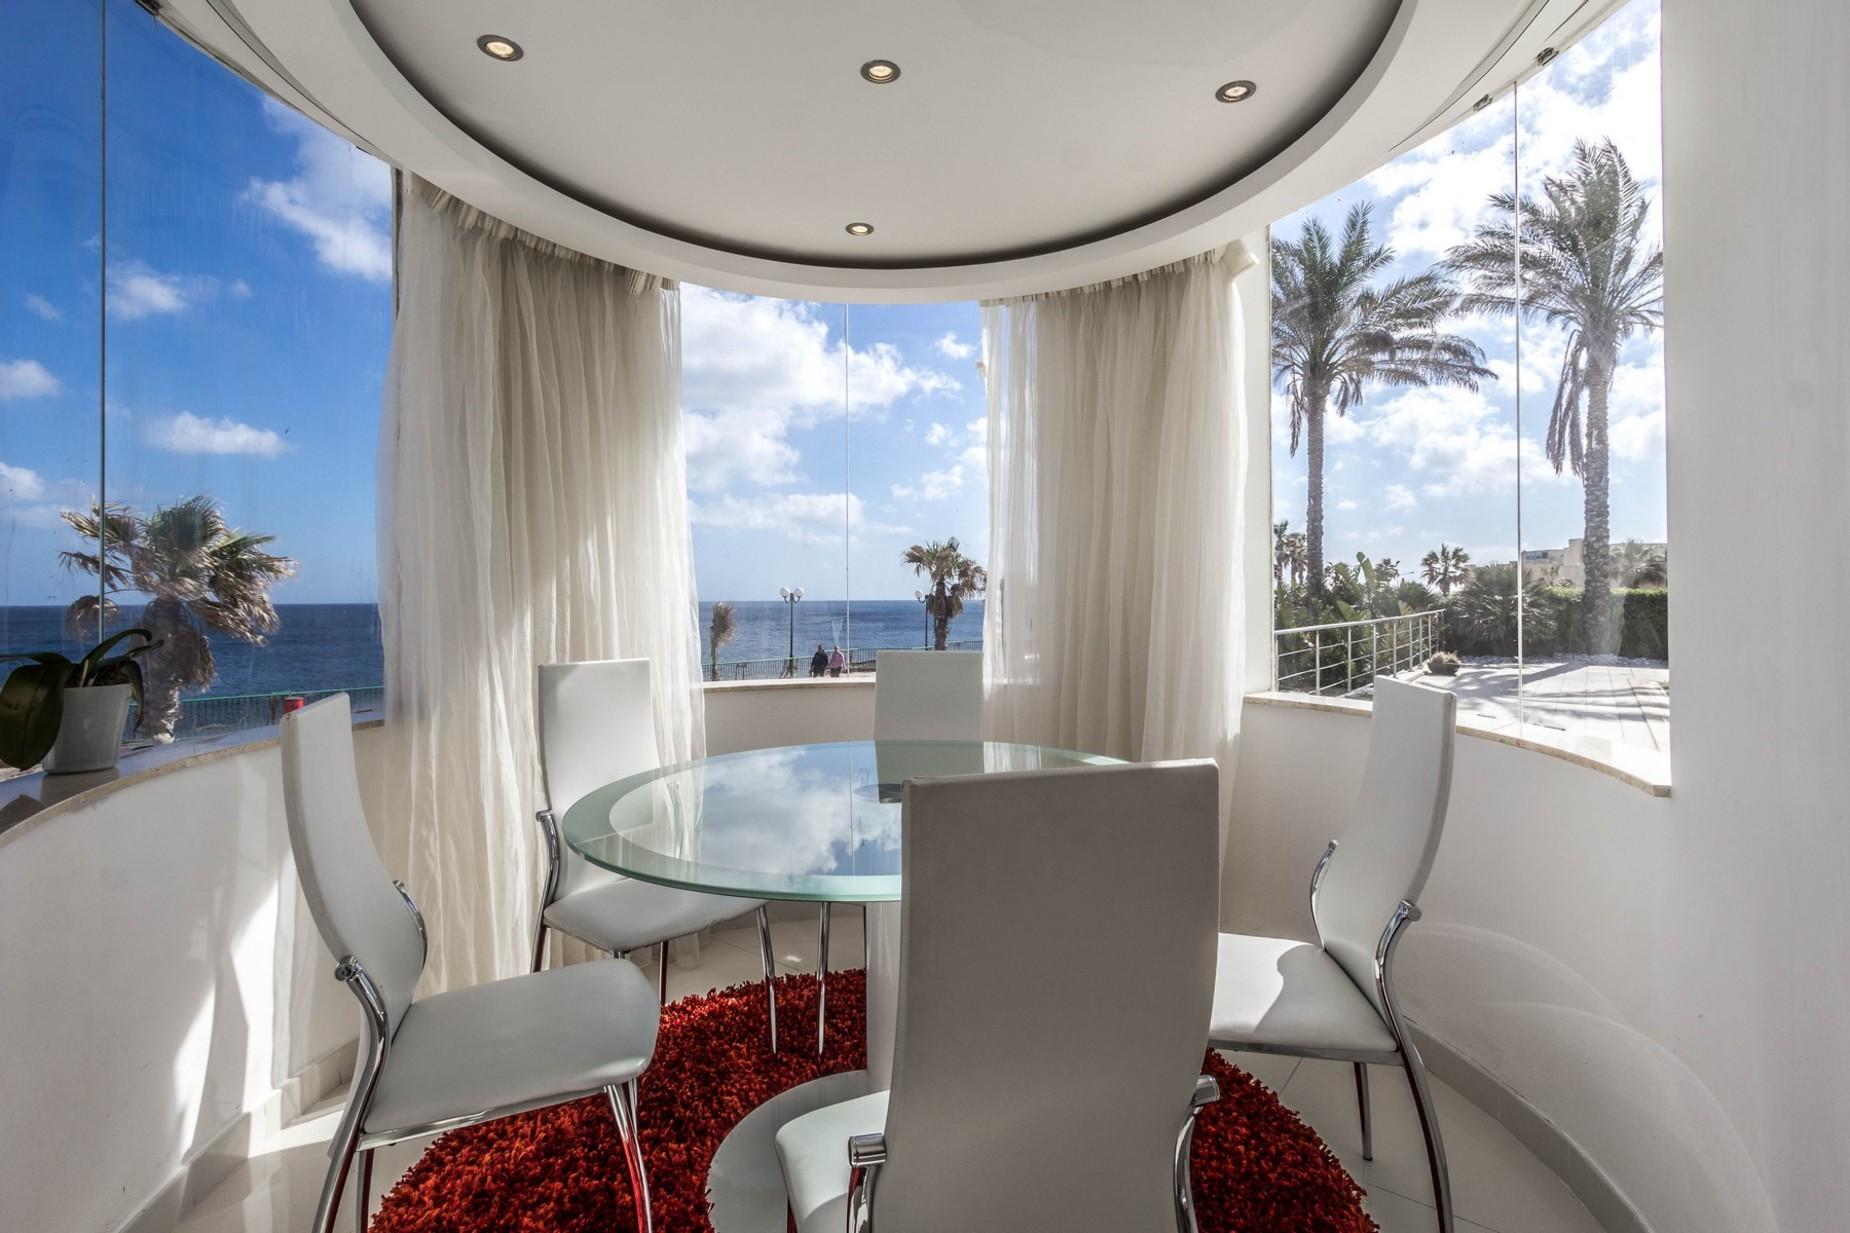 4 bed Villa For Rent in Marsascala, Marsascala - thumb 12